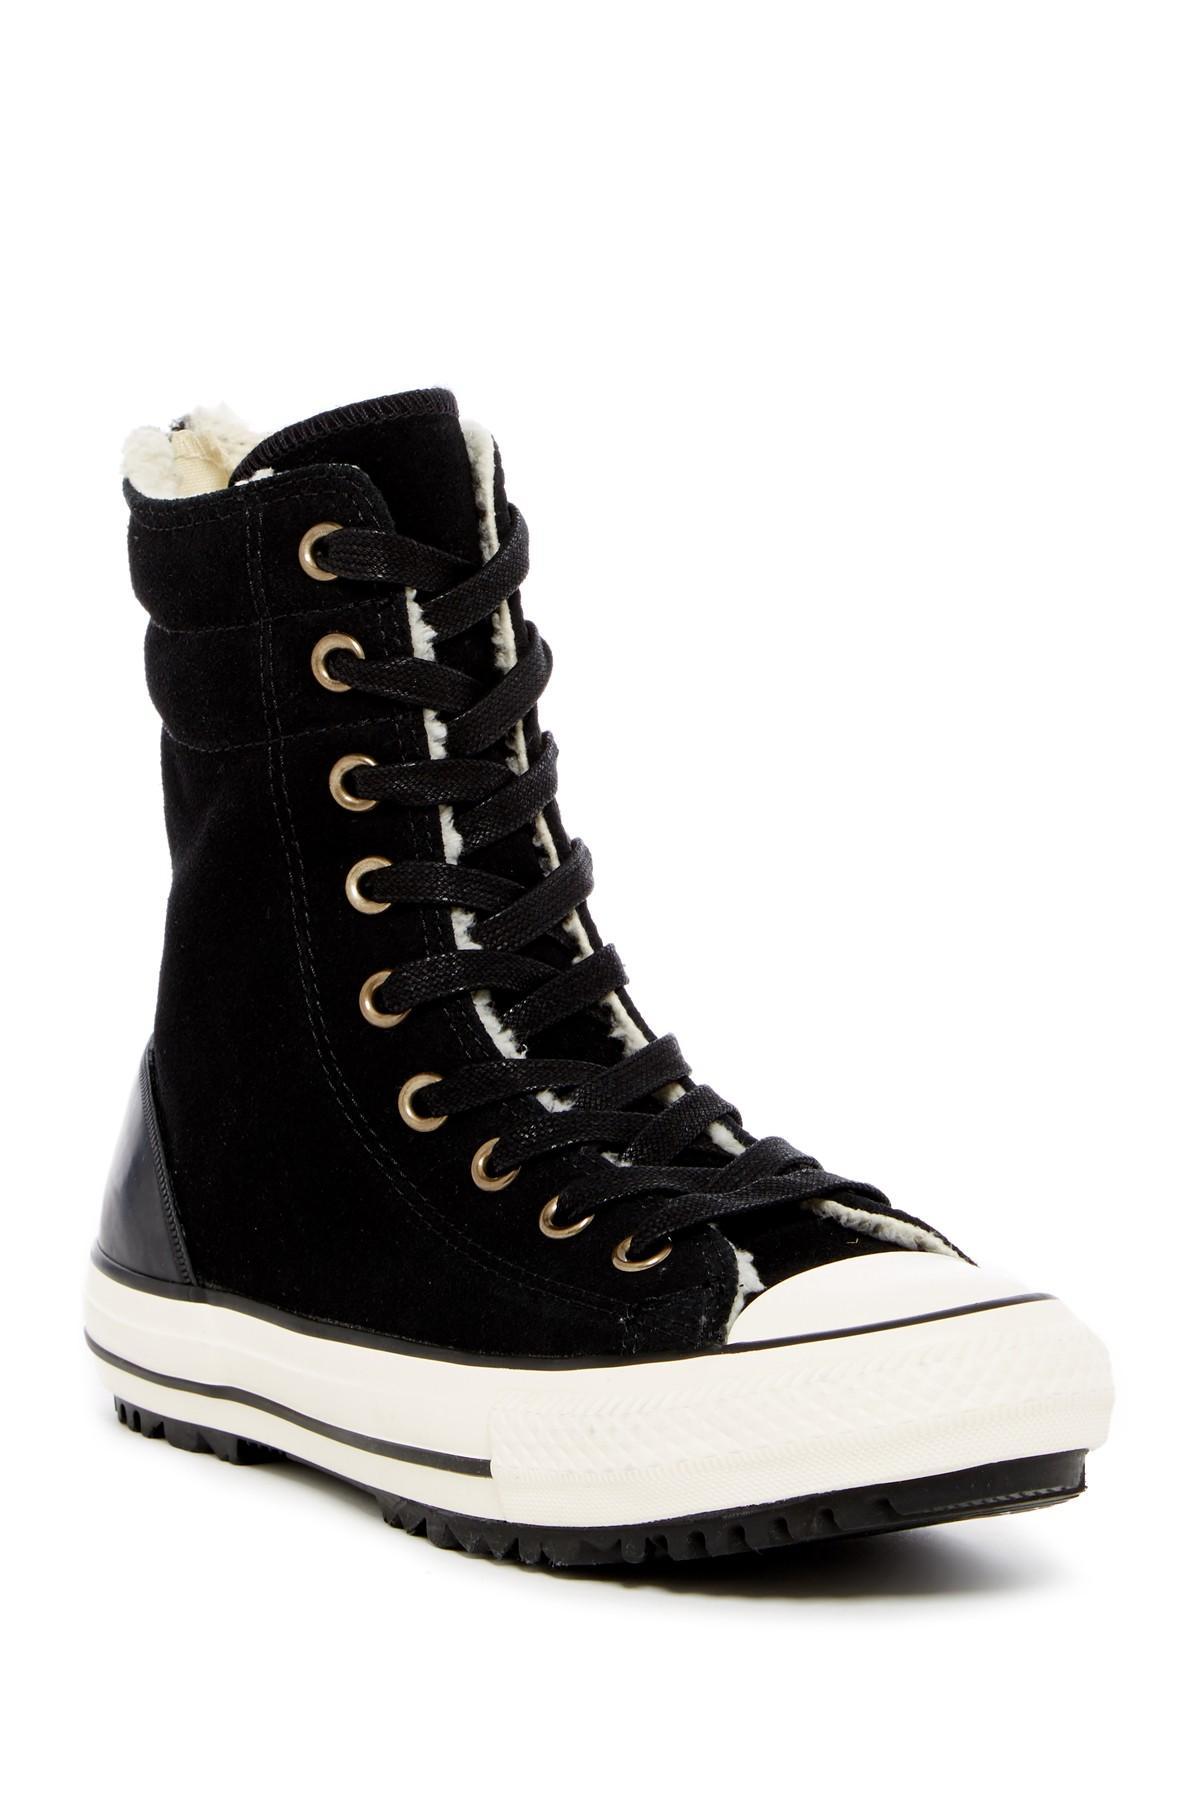 Nordstrom Rack Suede Mens Shoes